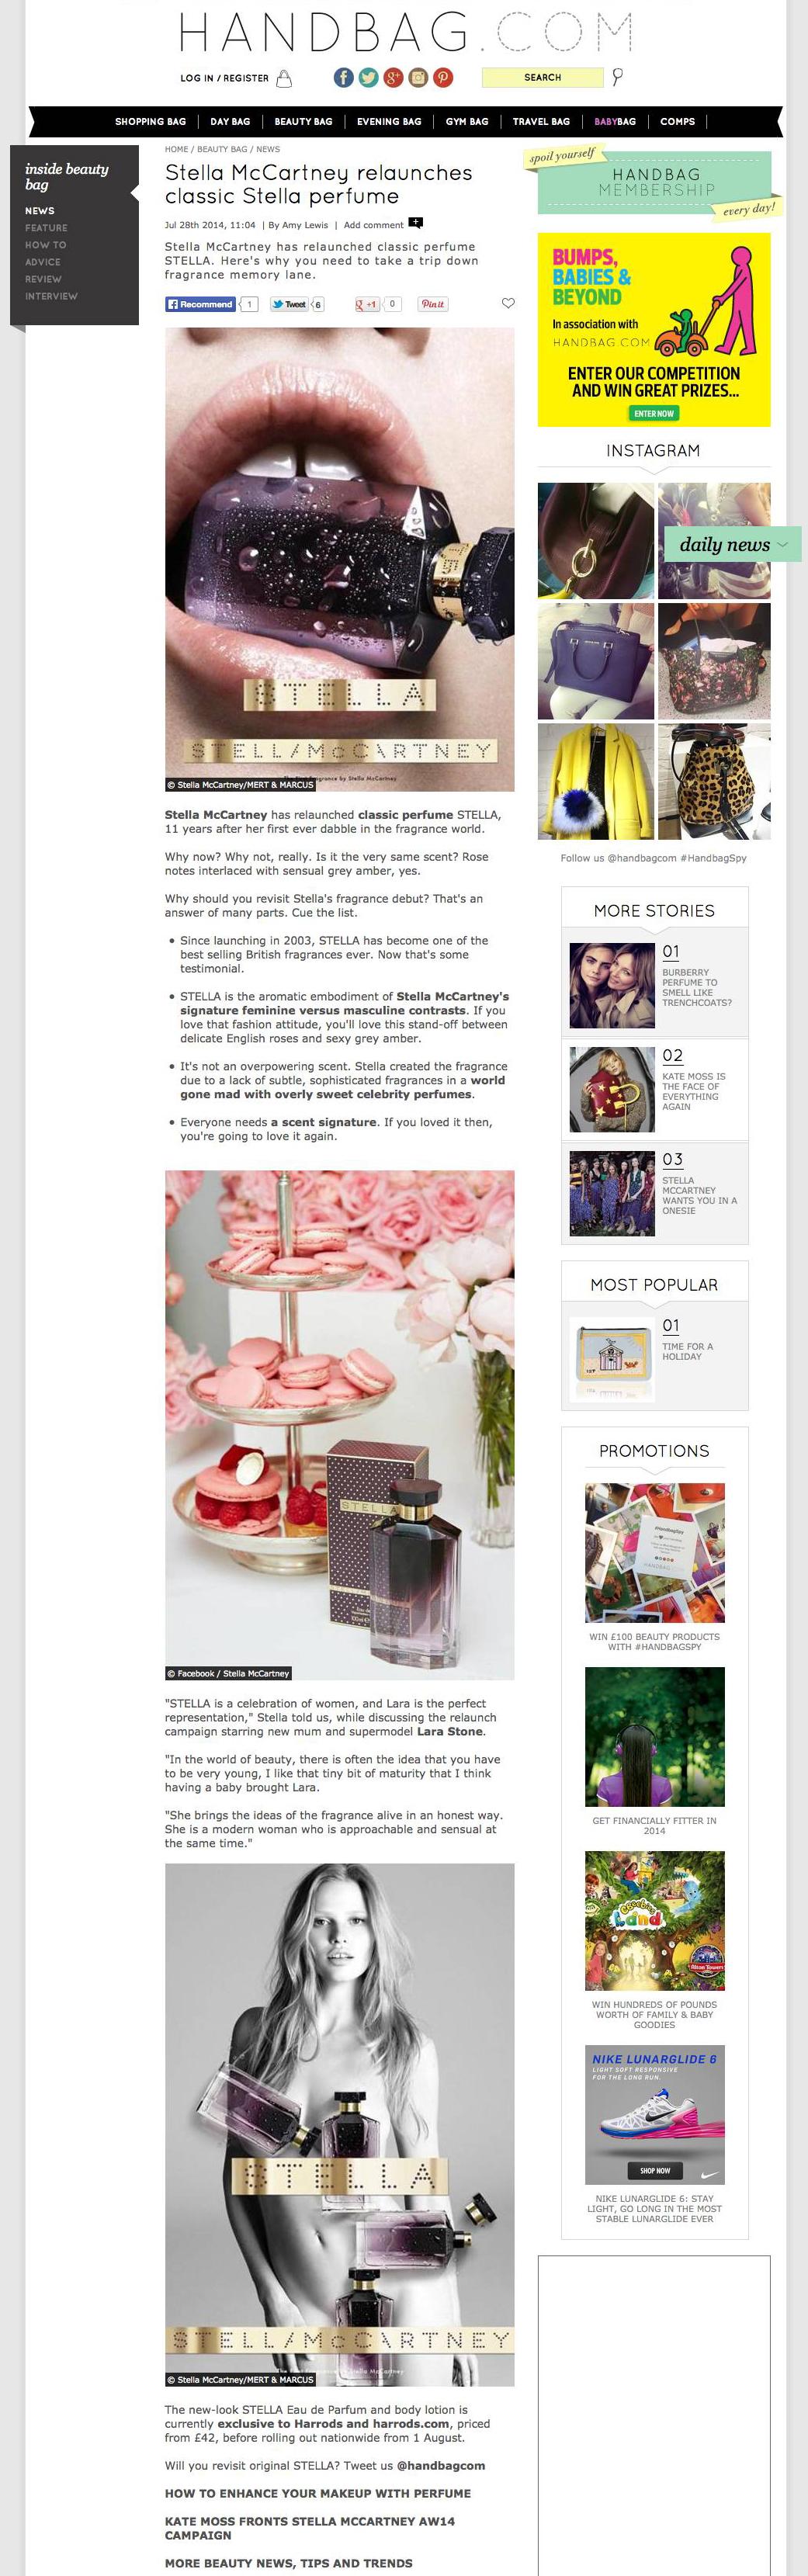 Stella McCartney relaunches classic Stella perfume